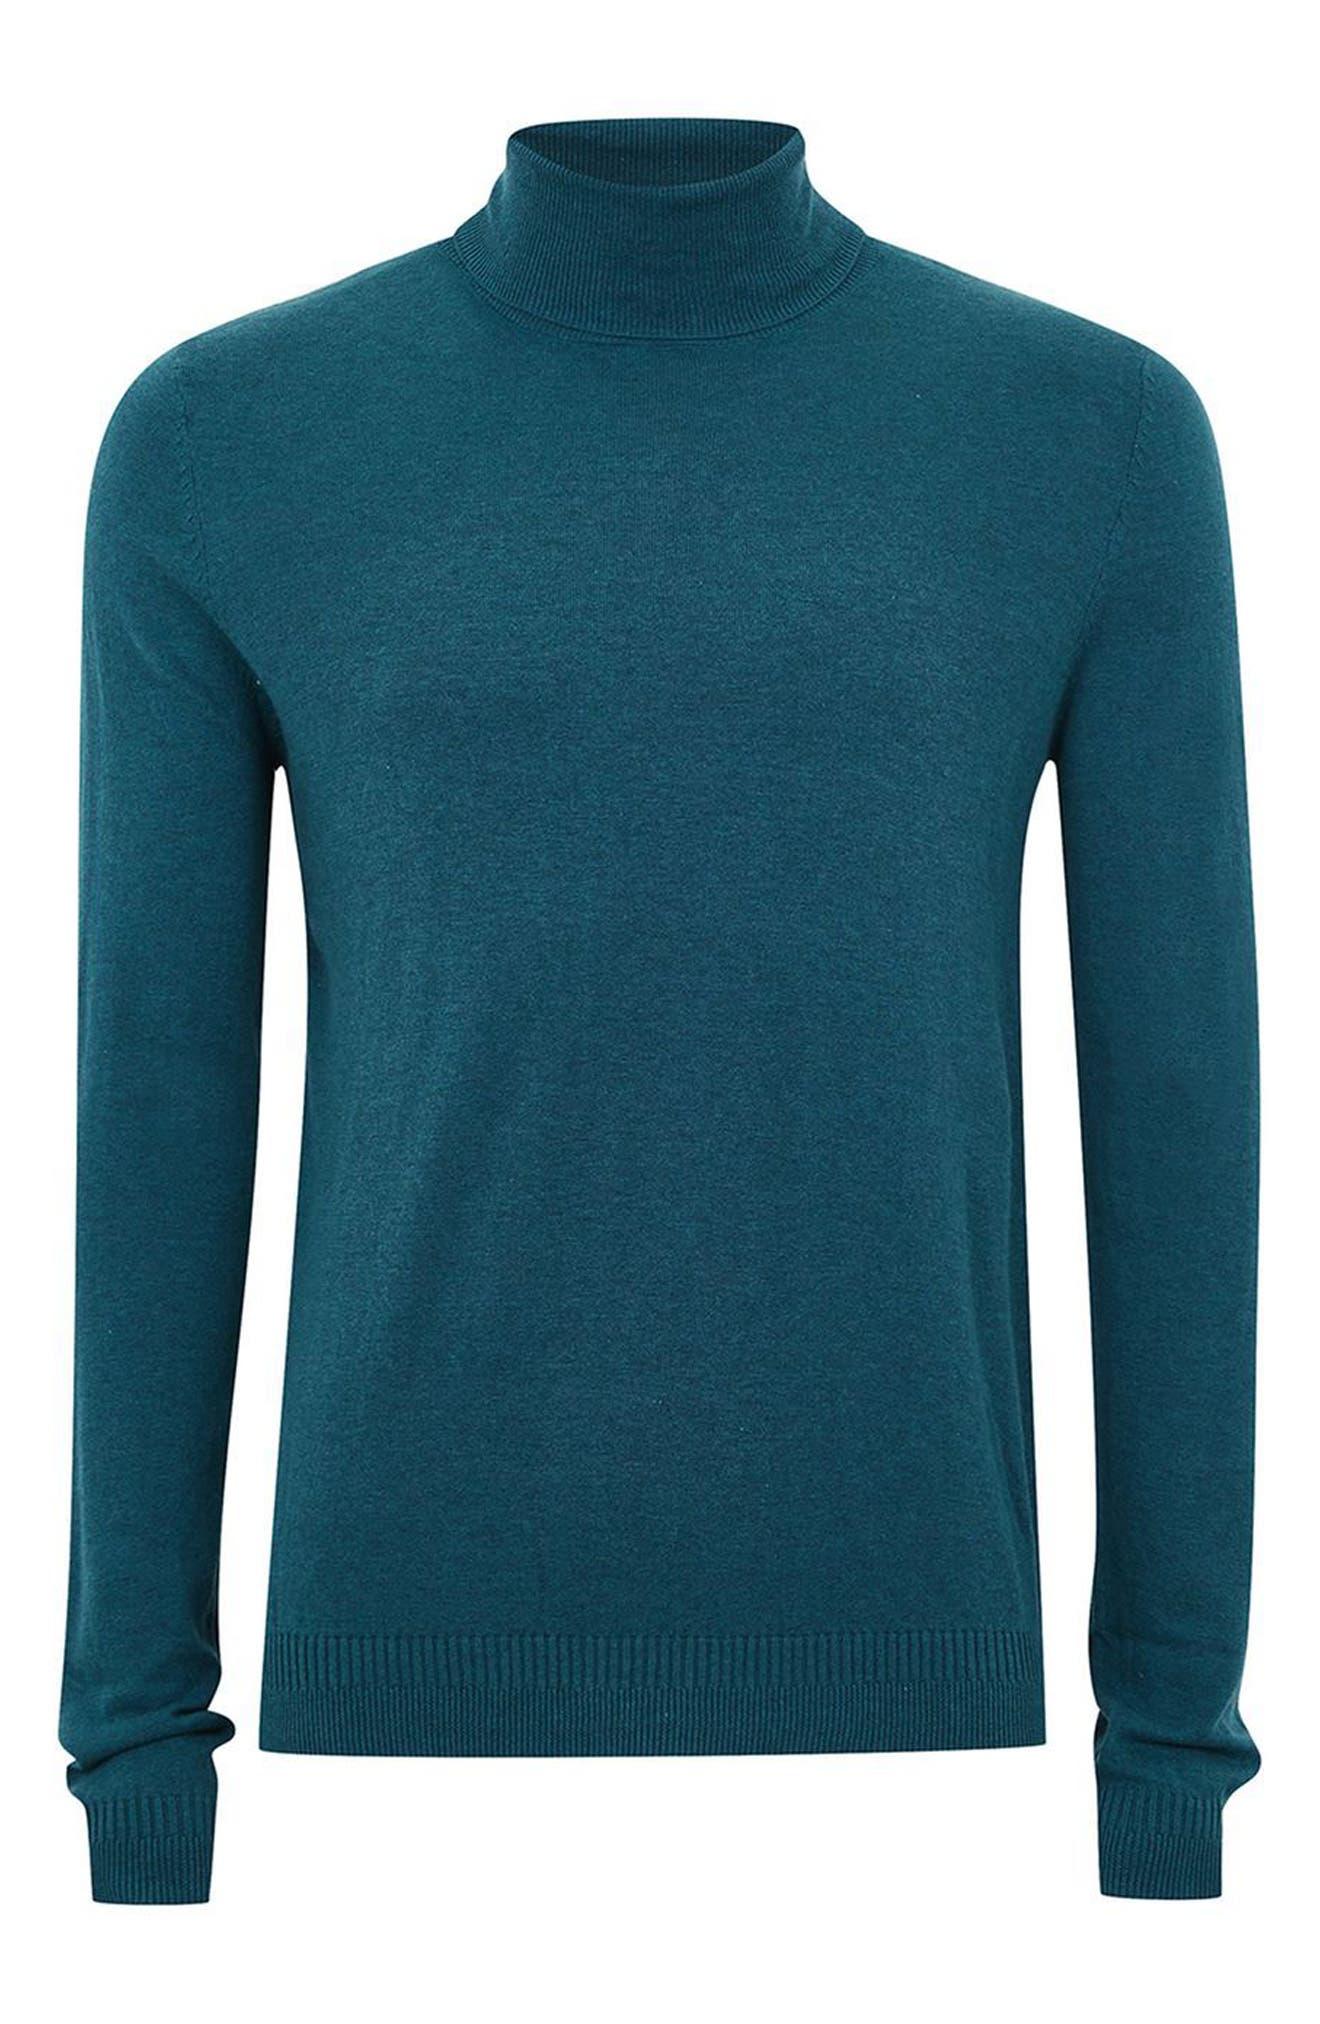 Cotton Turtleneck Sweater,                             Alternate thumbnail 11, color,